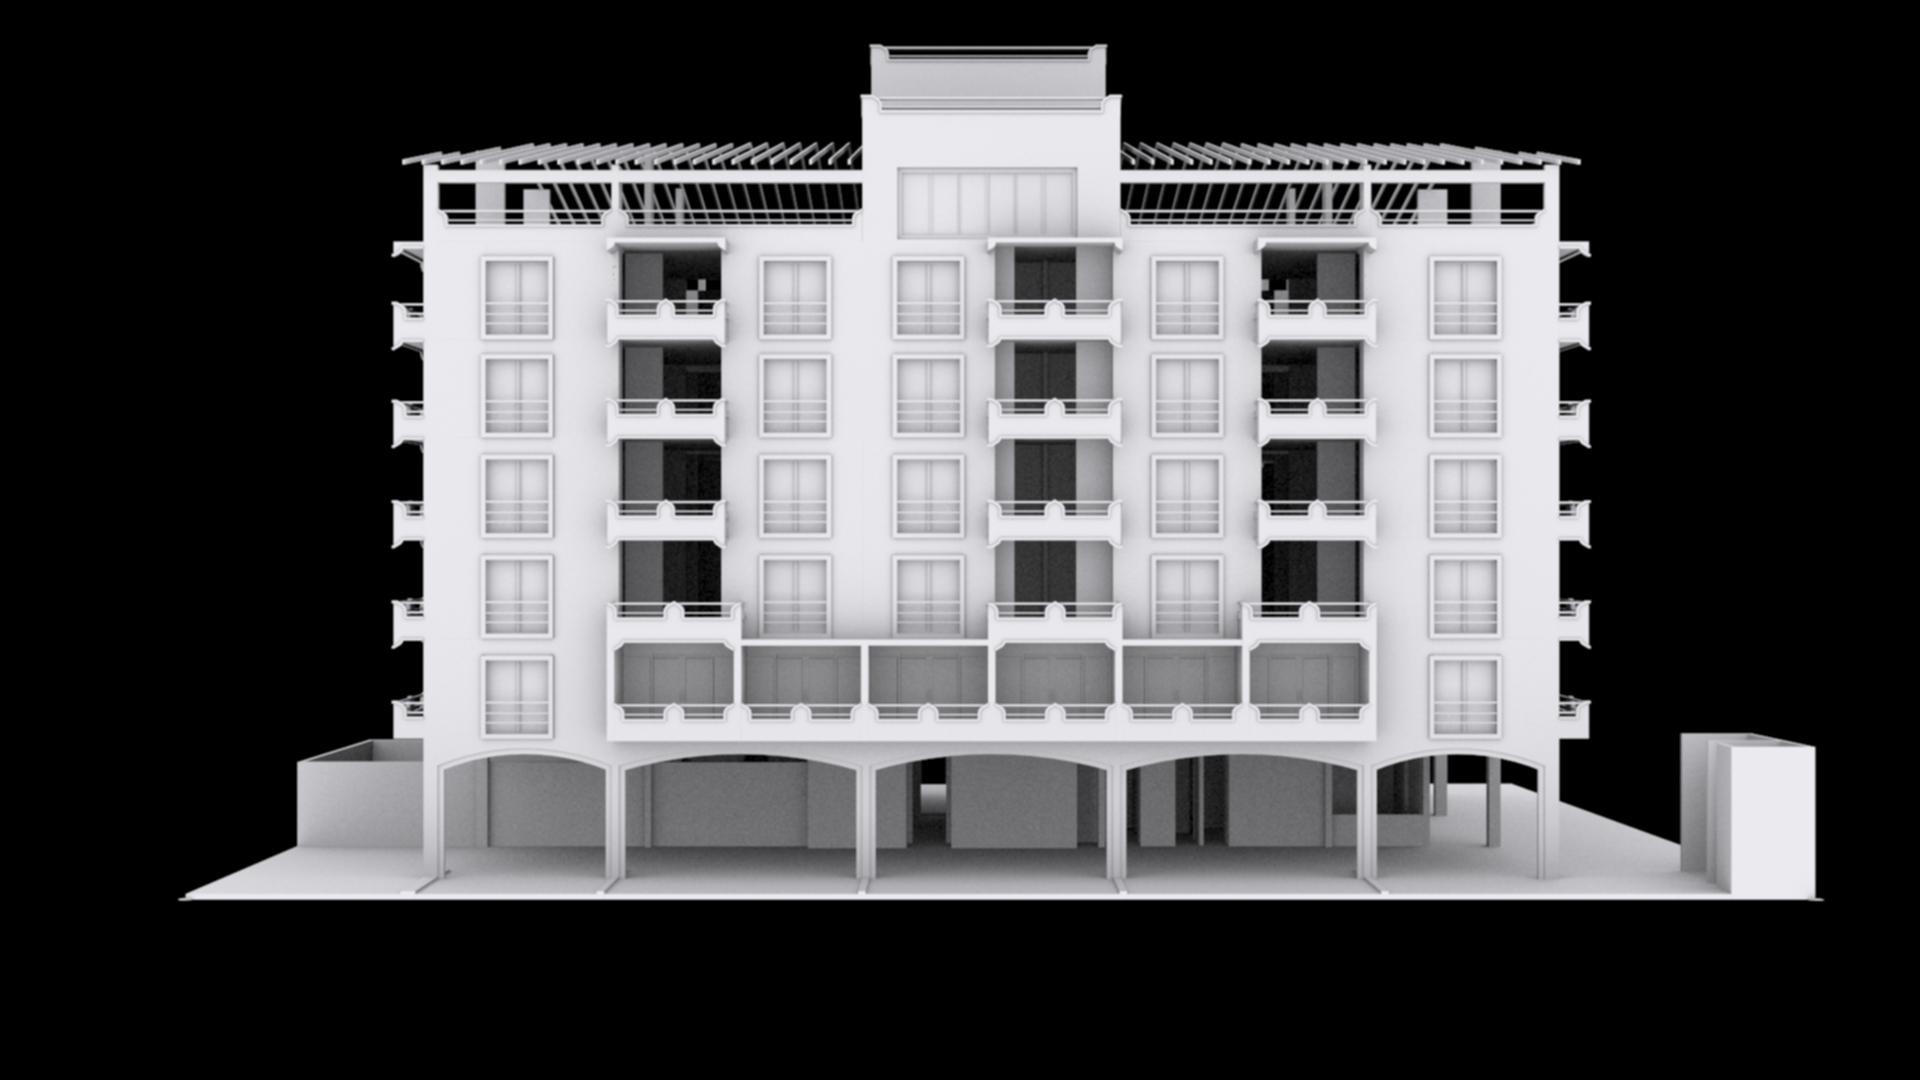 3d Architecture Blackburn Accrington Architectural